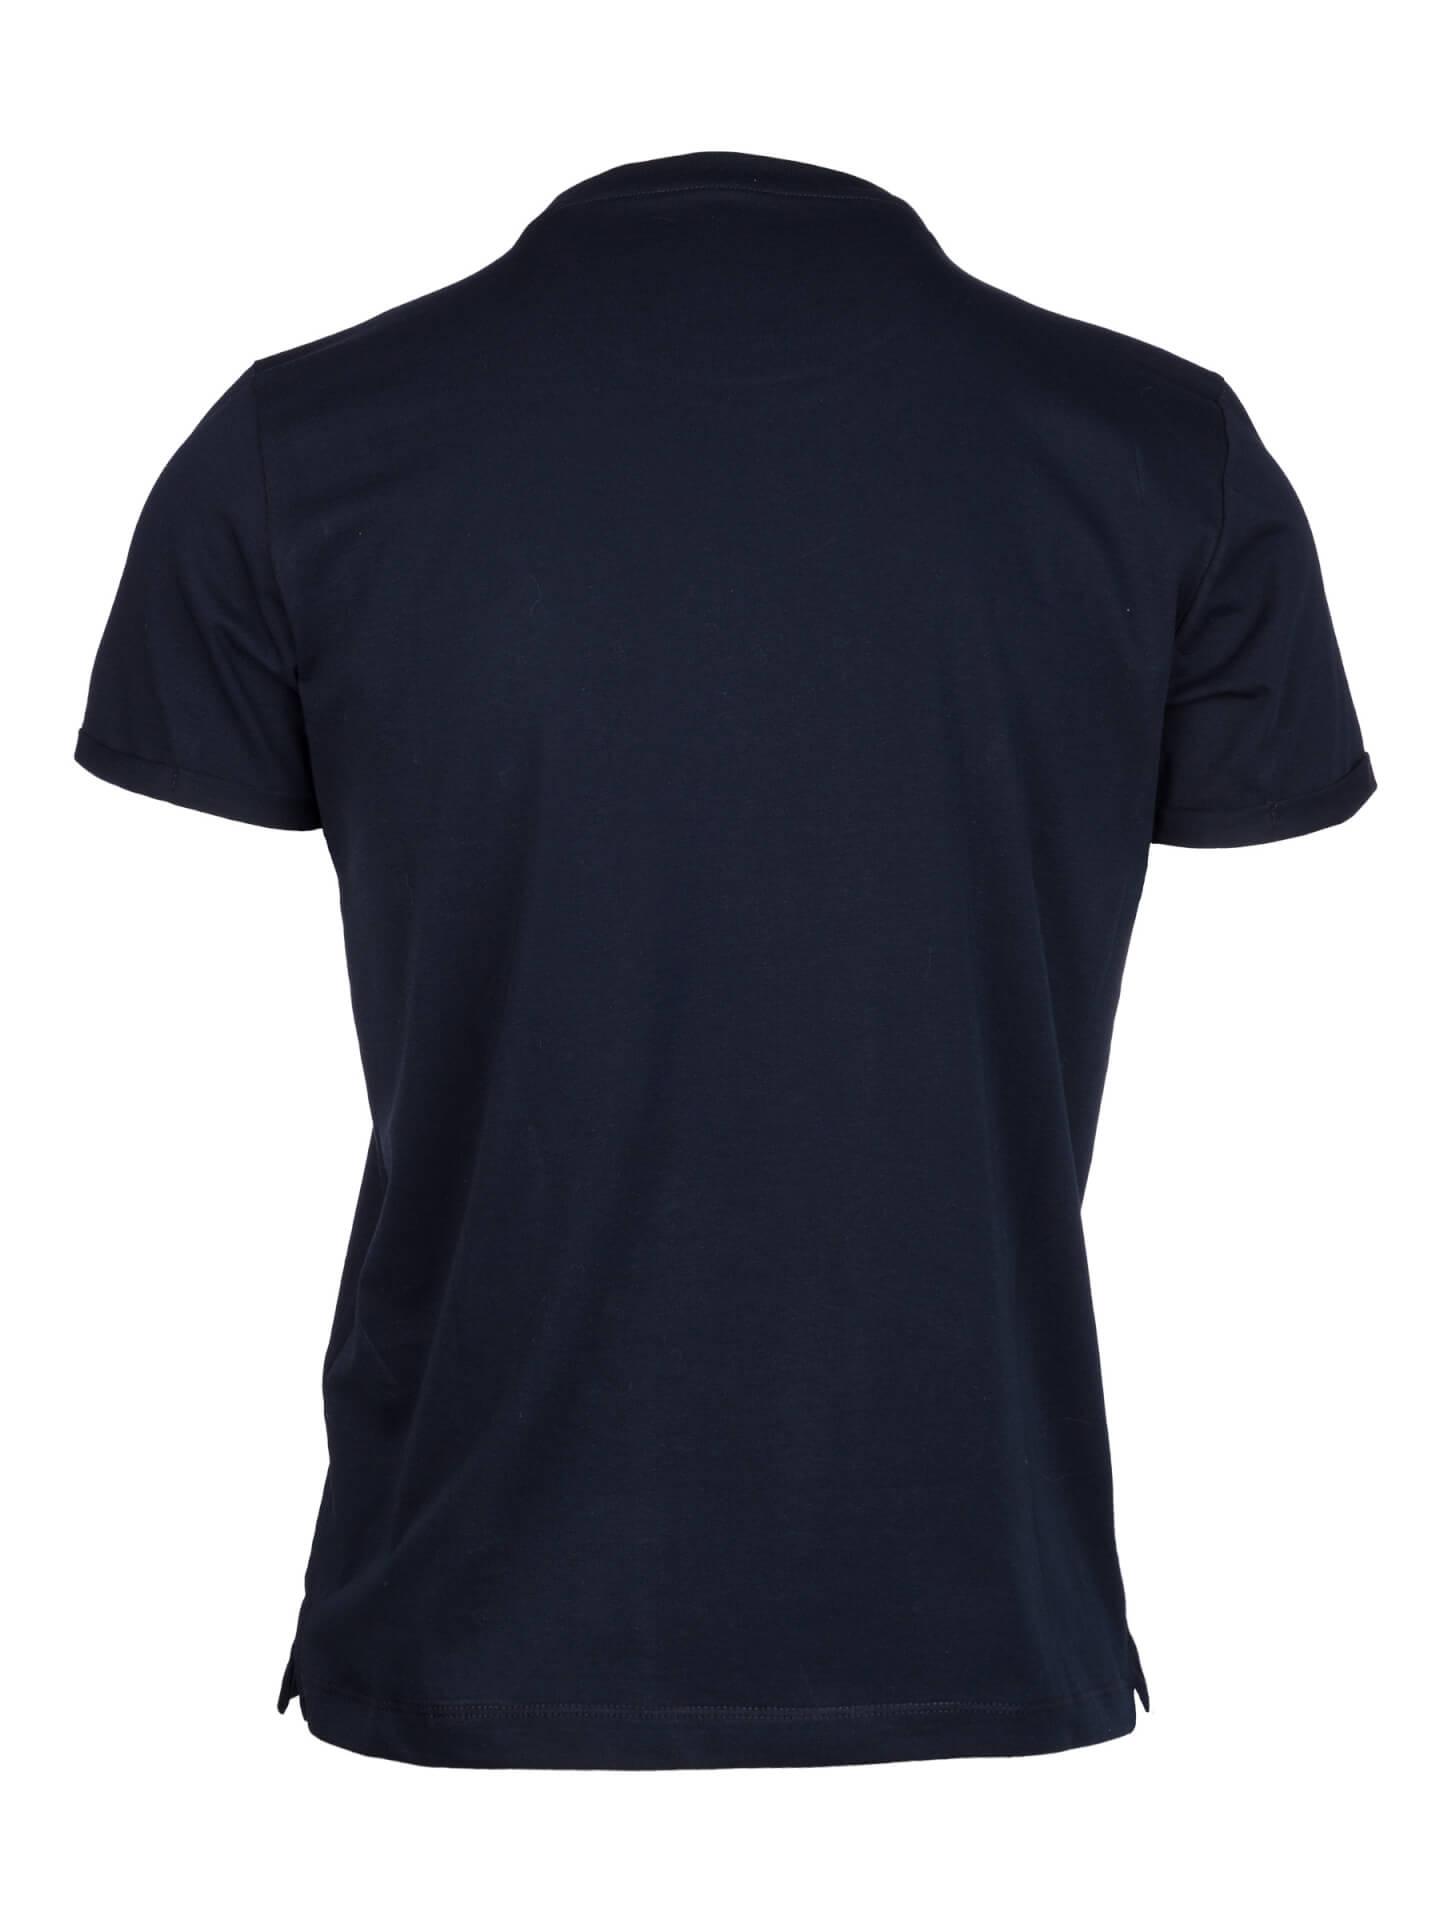 T-shirt Q36.5 Blue Navy